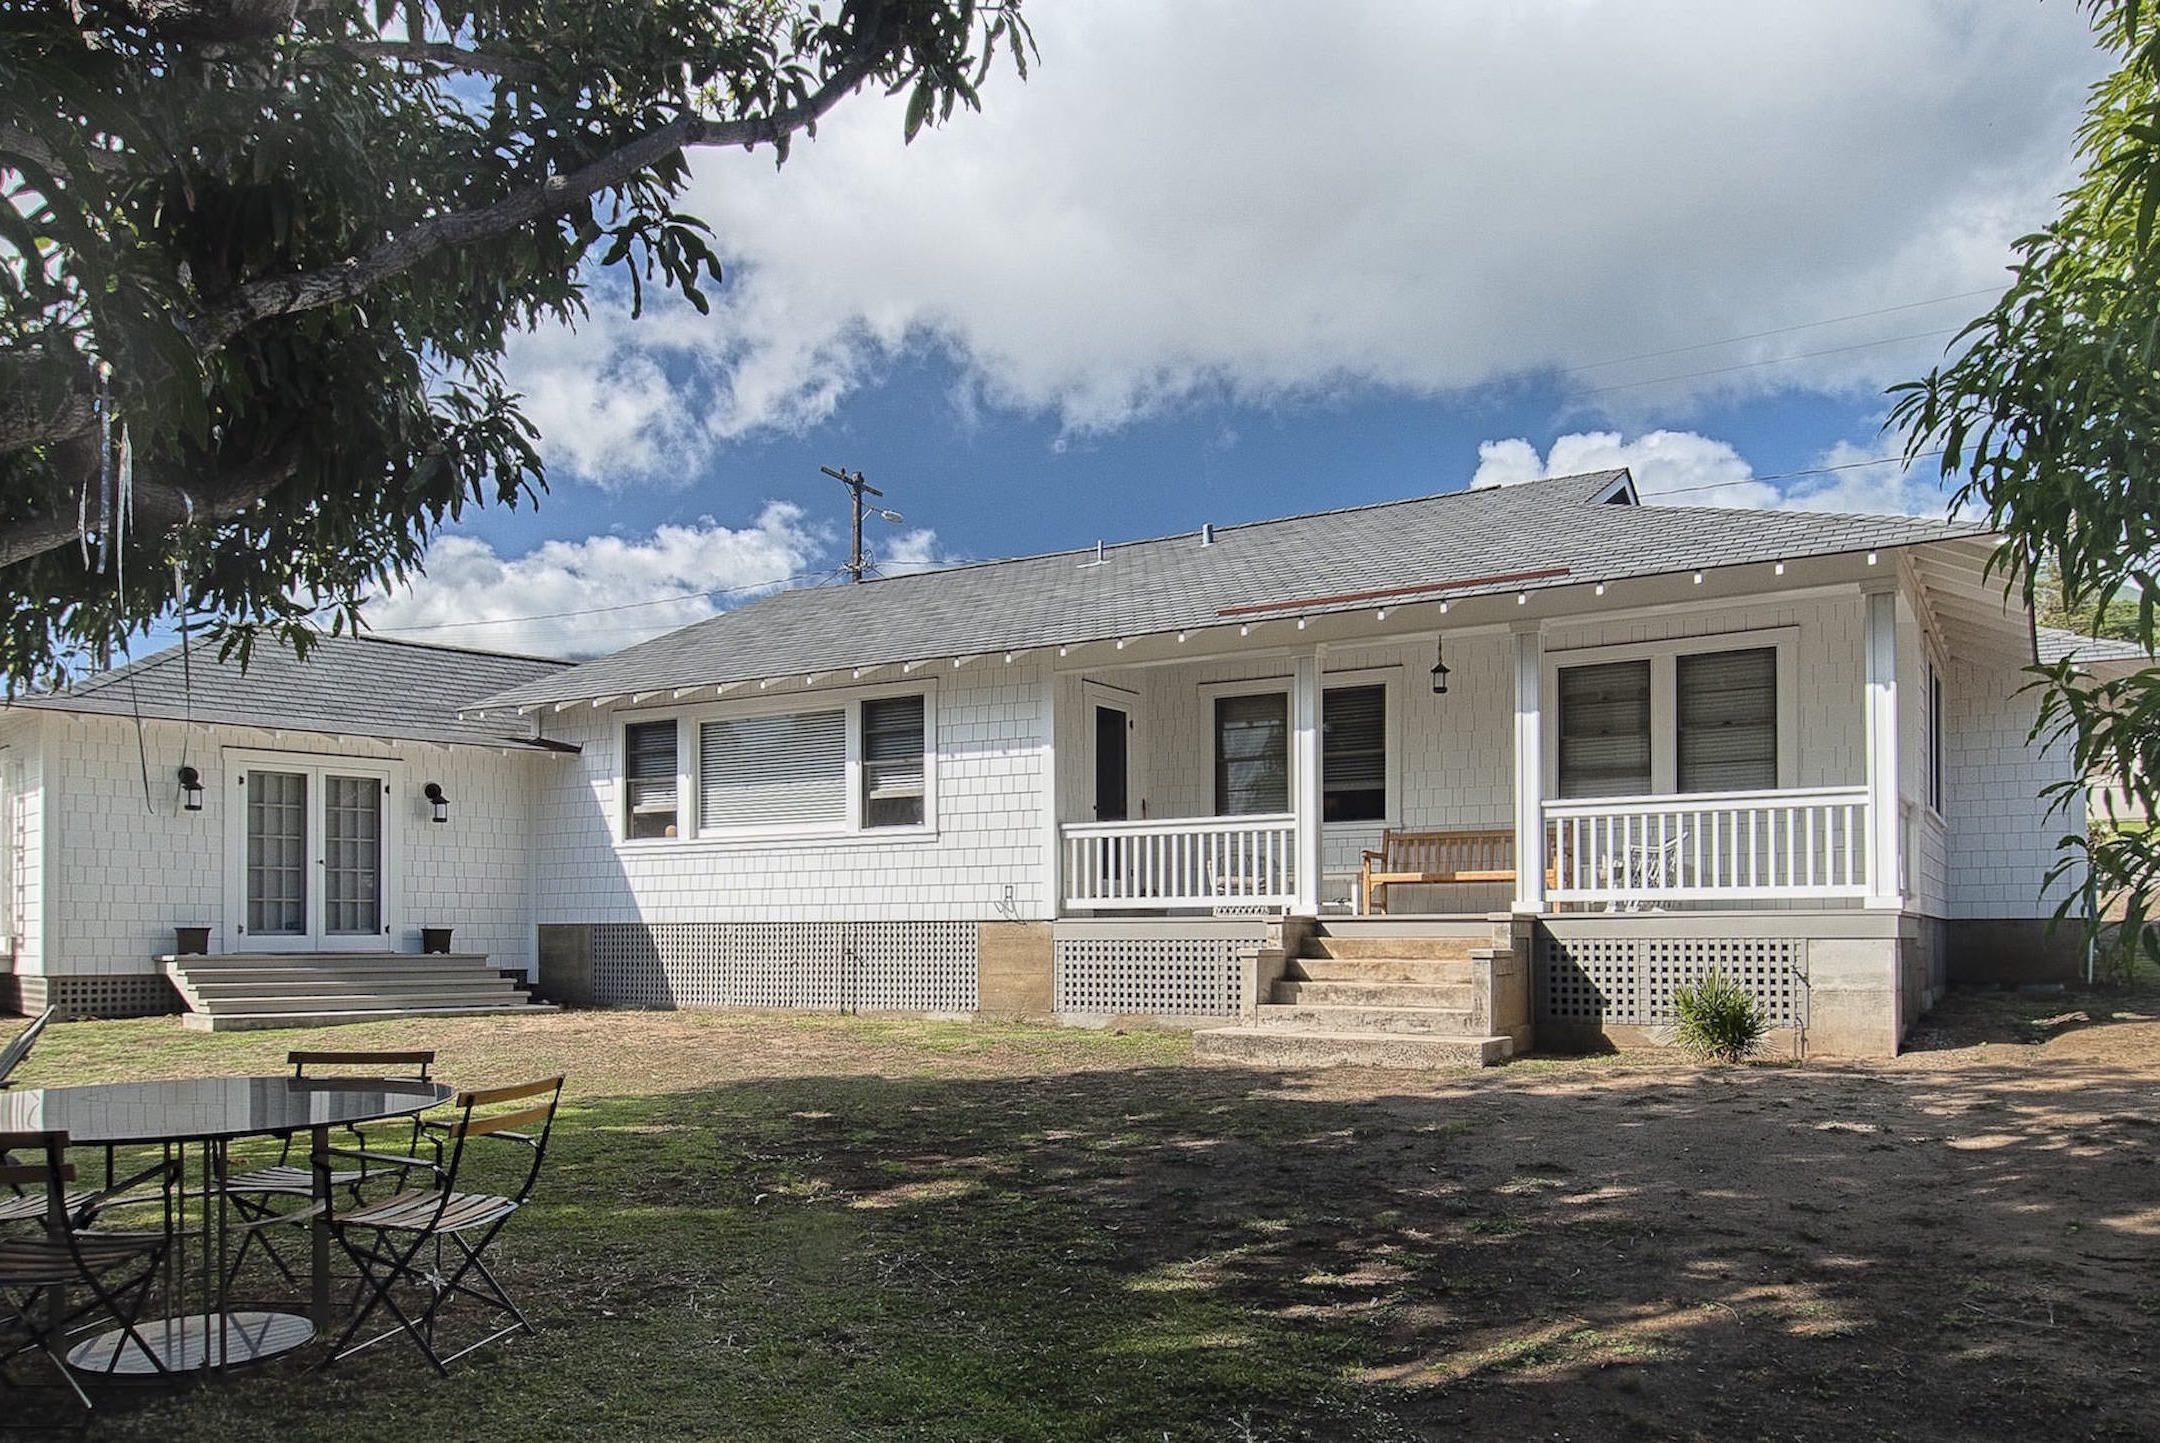 16-wailuku-historic-bungalow-exterior-marshall.jpg